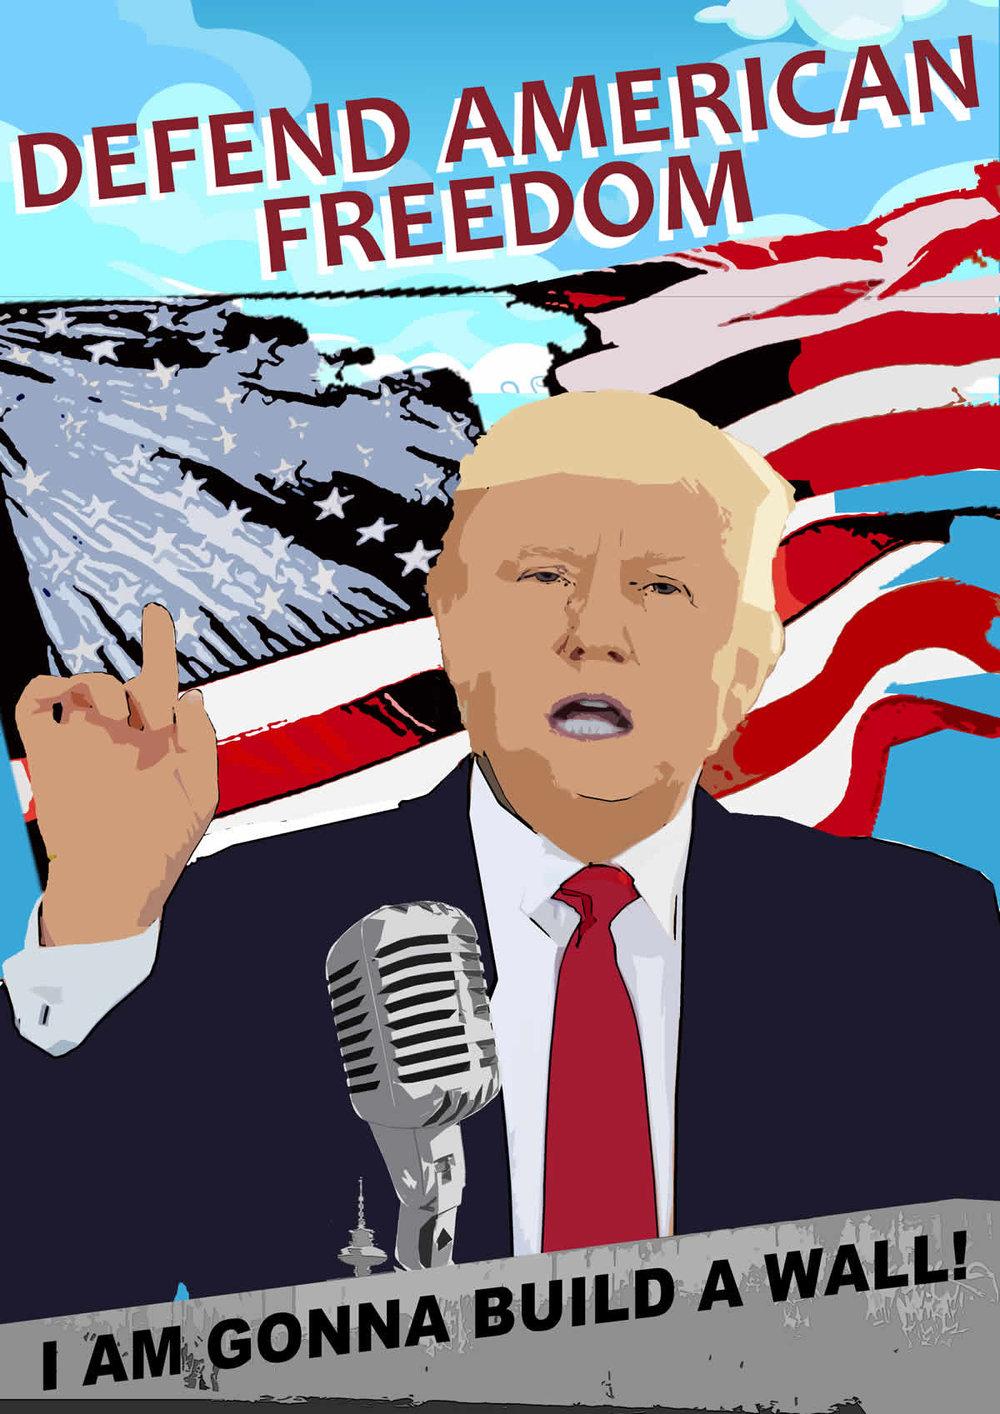 donal-trump-propaganda-poster-1.jpg